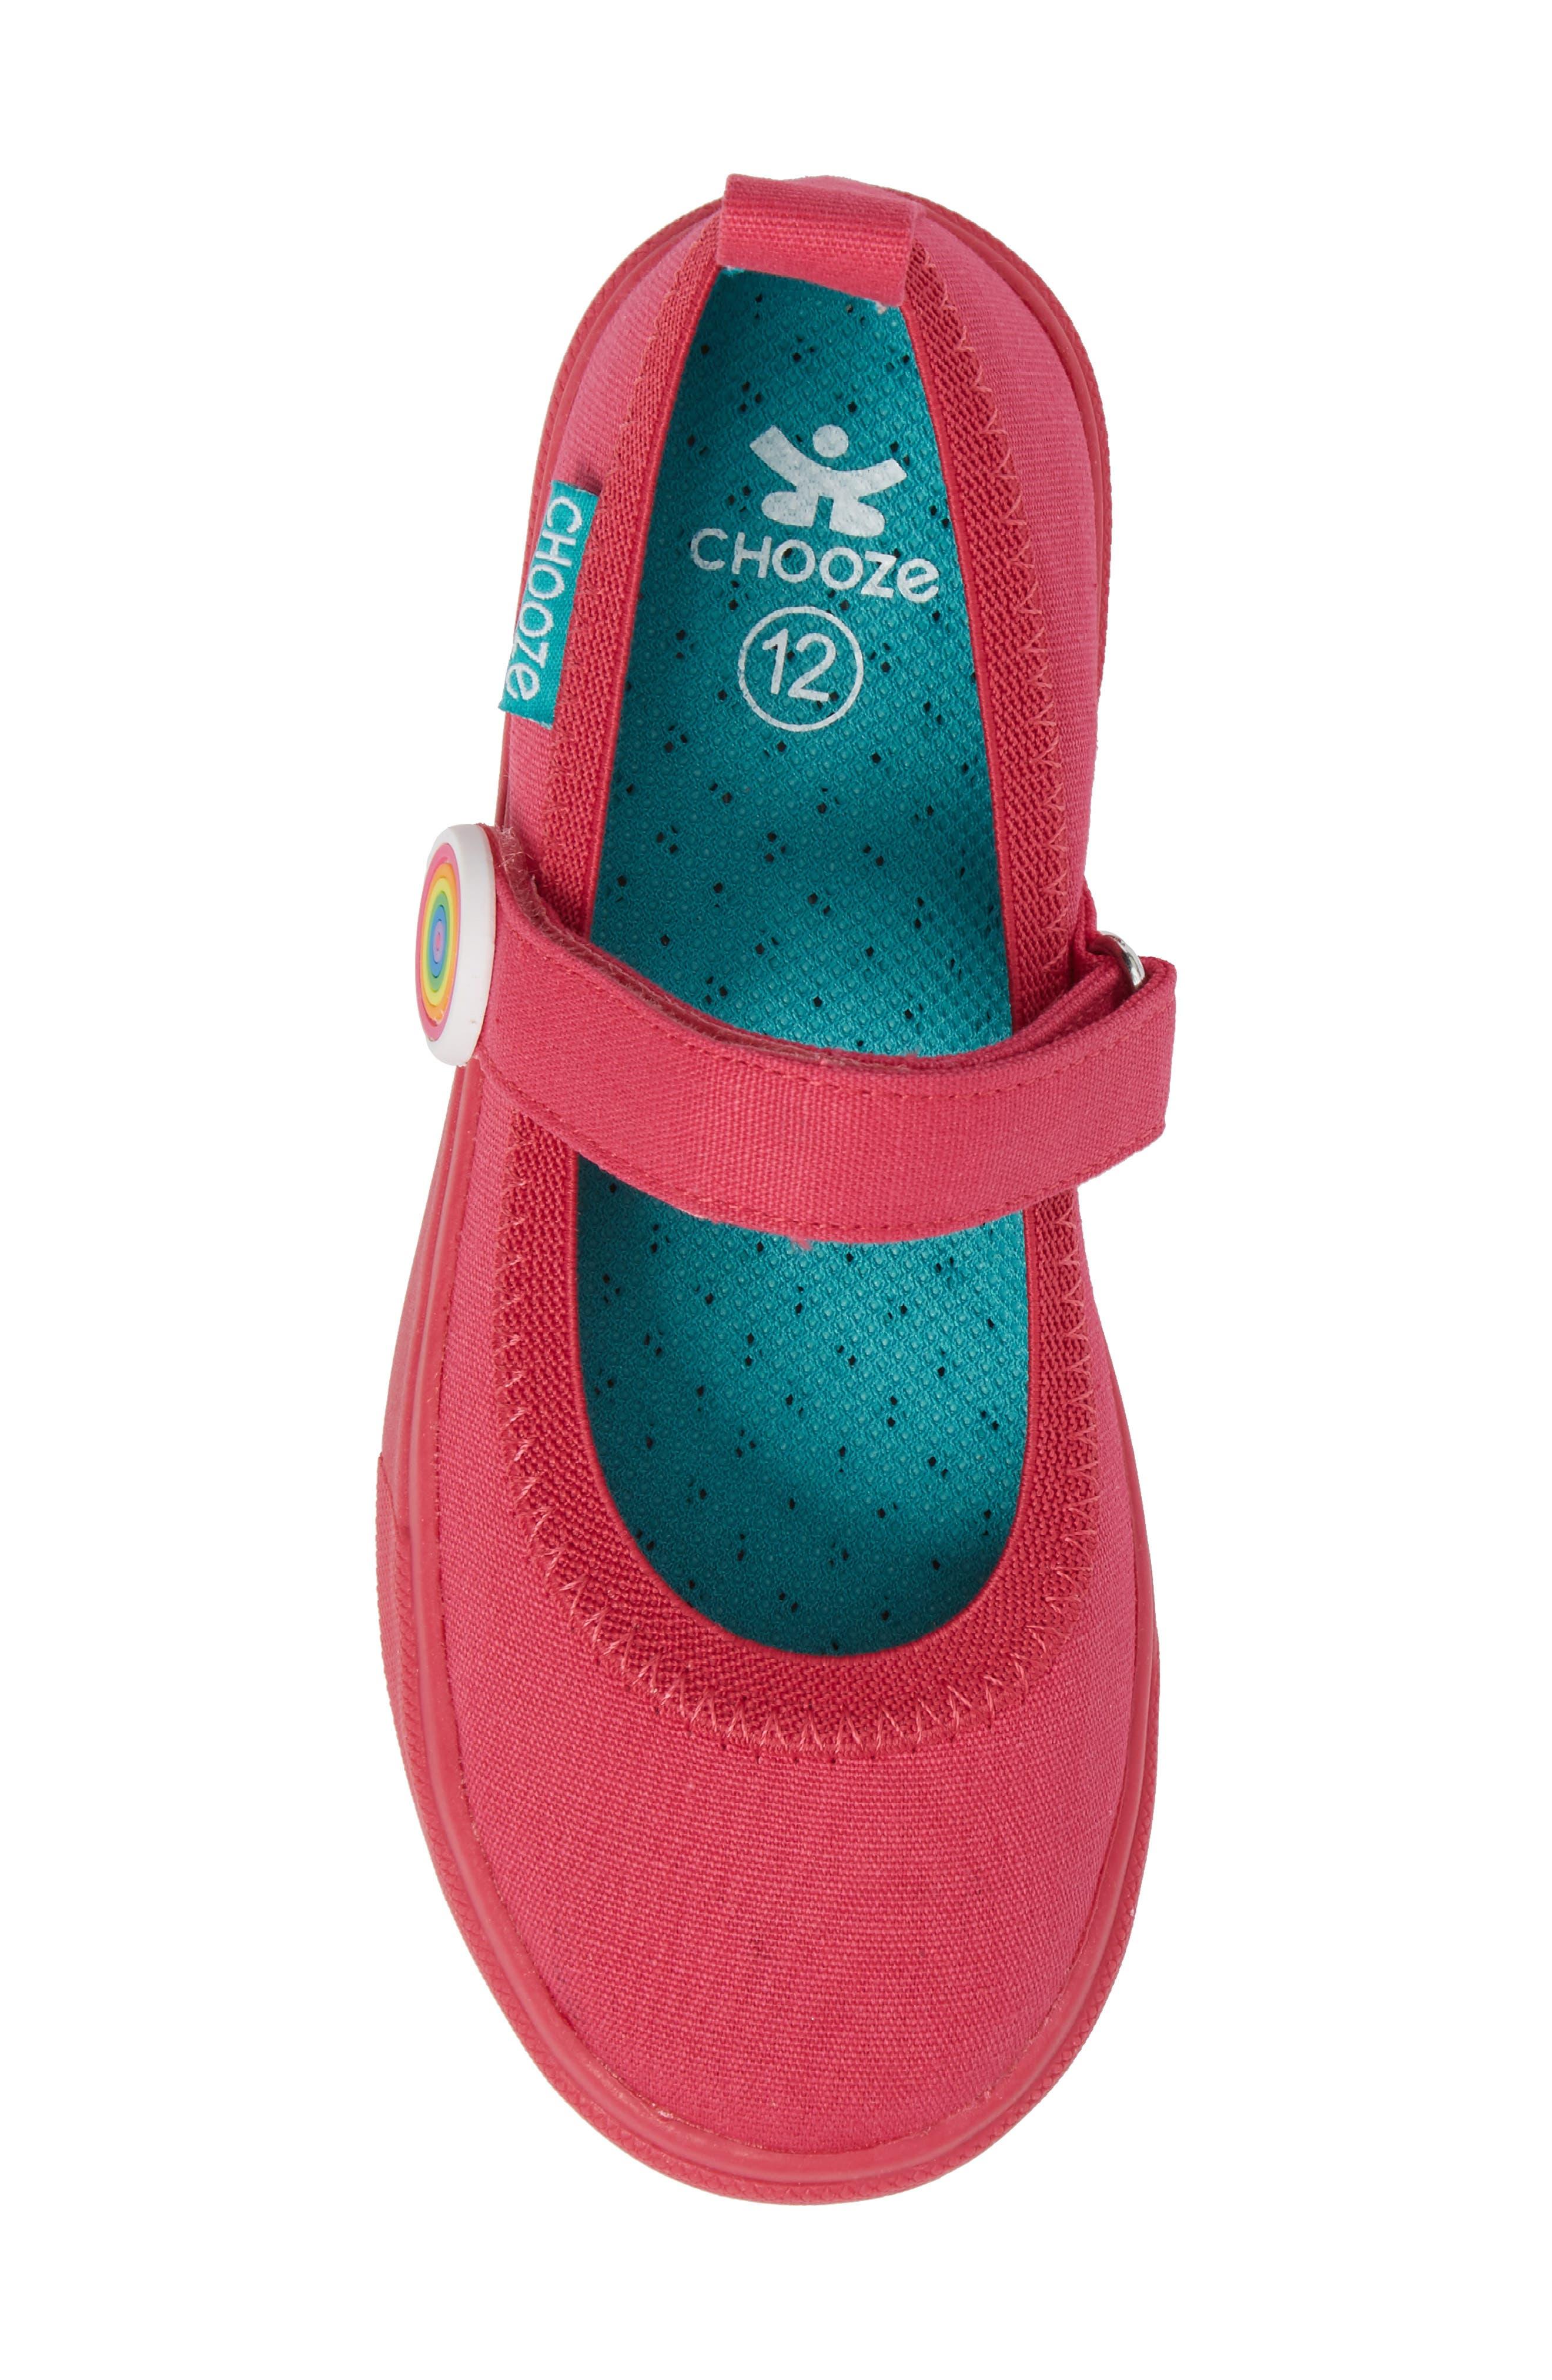 Skip Mary Jane Sneaker,                             Alternate thumbnail 5, color,                             PRISM